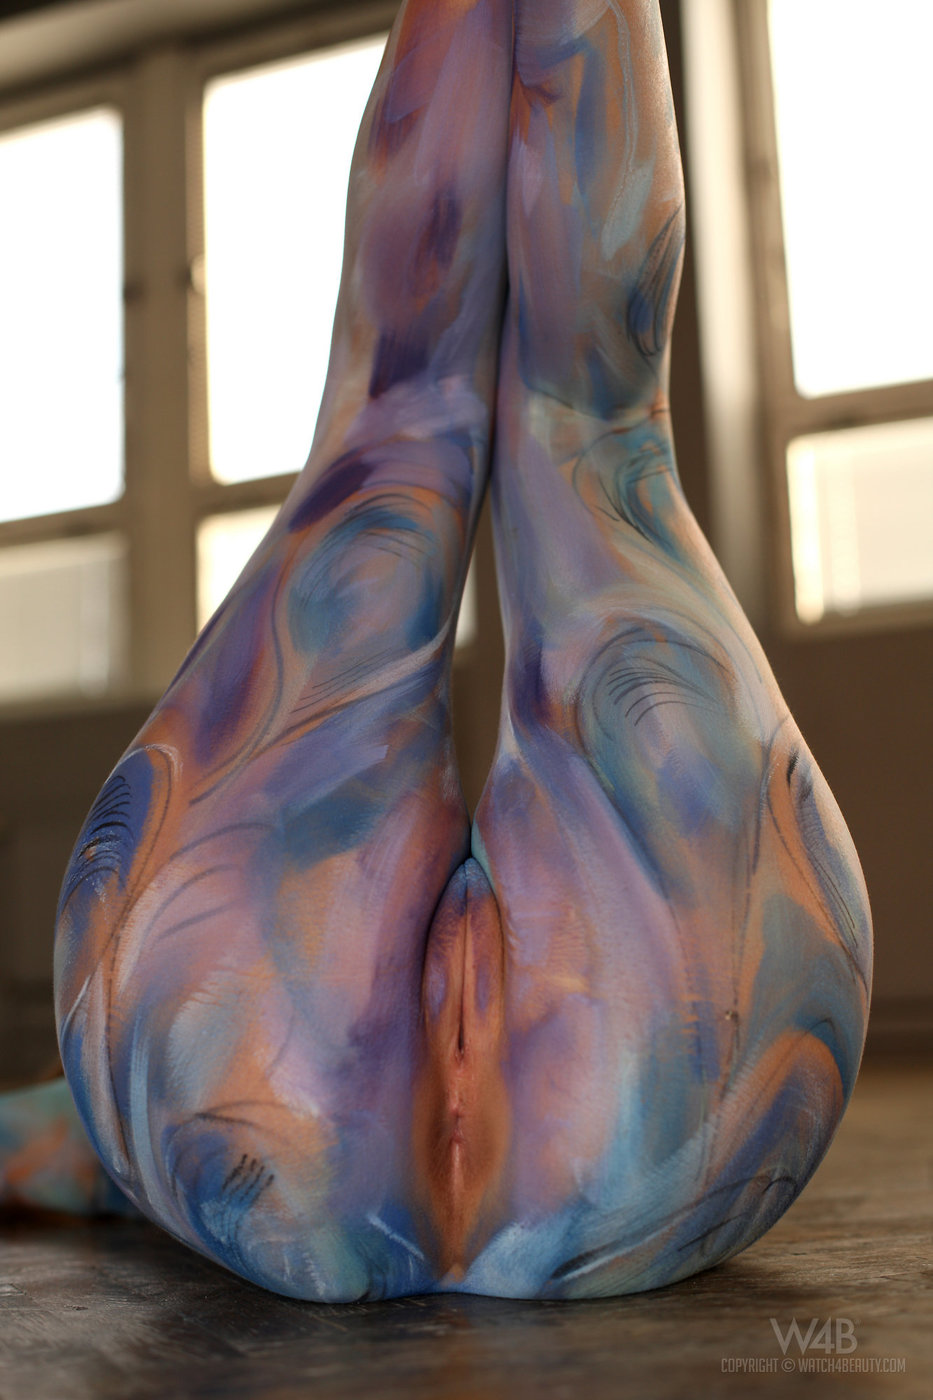 Bodypaint nude vagina — img 14